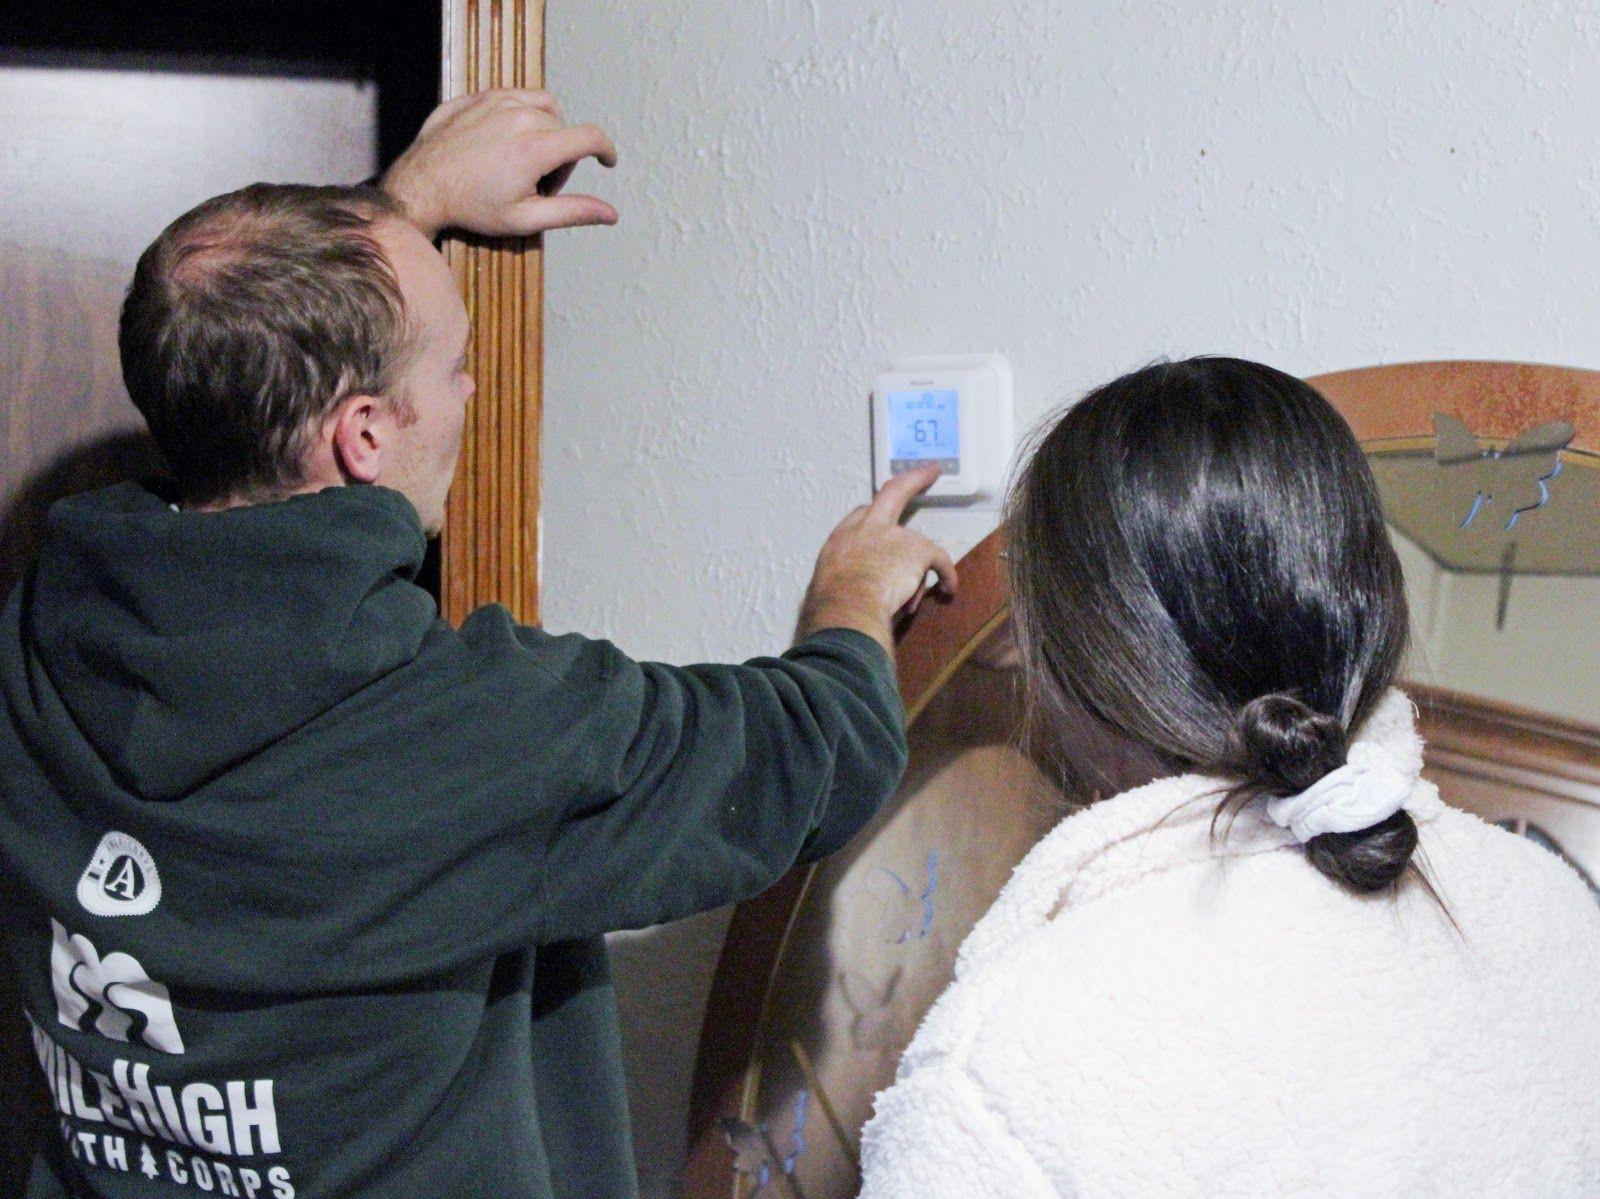 thermostat5.jpg detail image